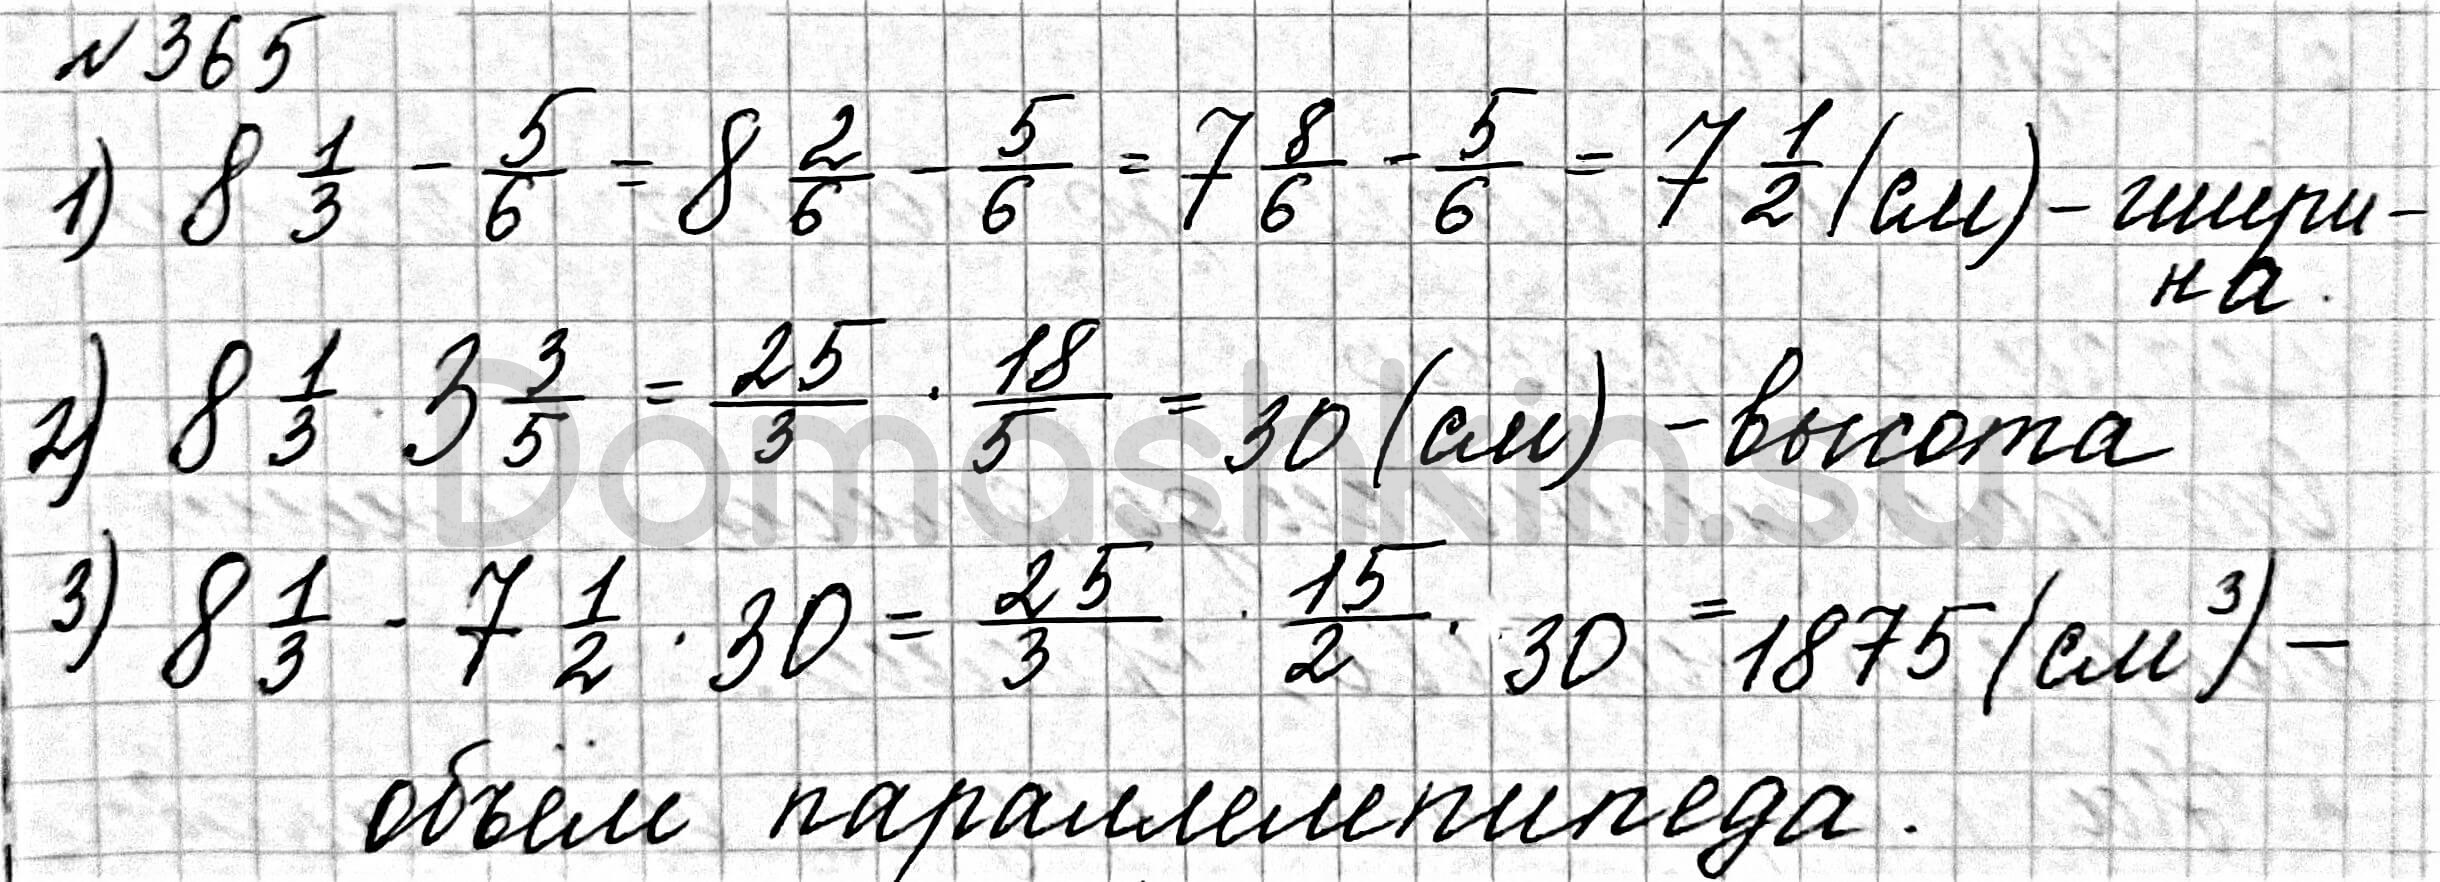 Математика 6 класс учебник Мерзляк номер 365 решение